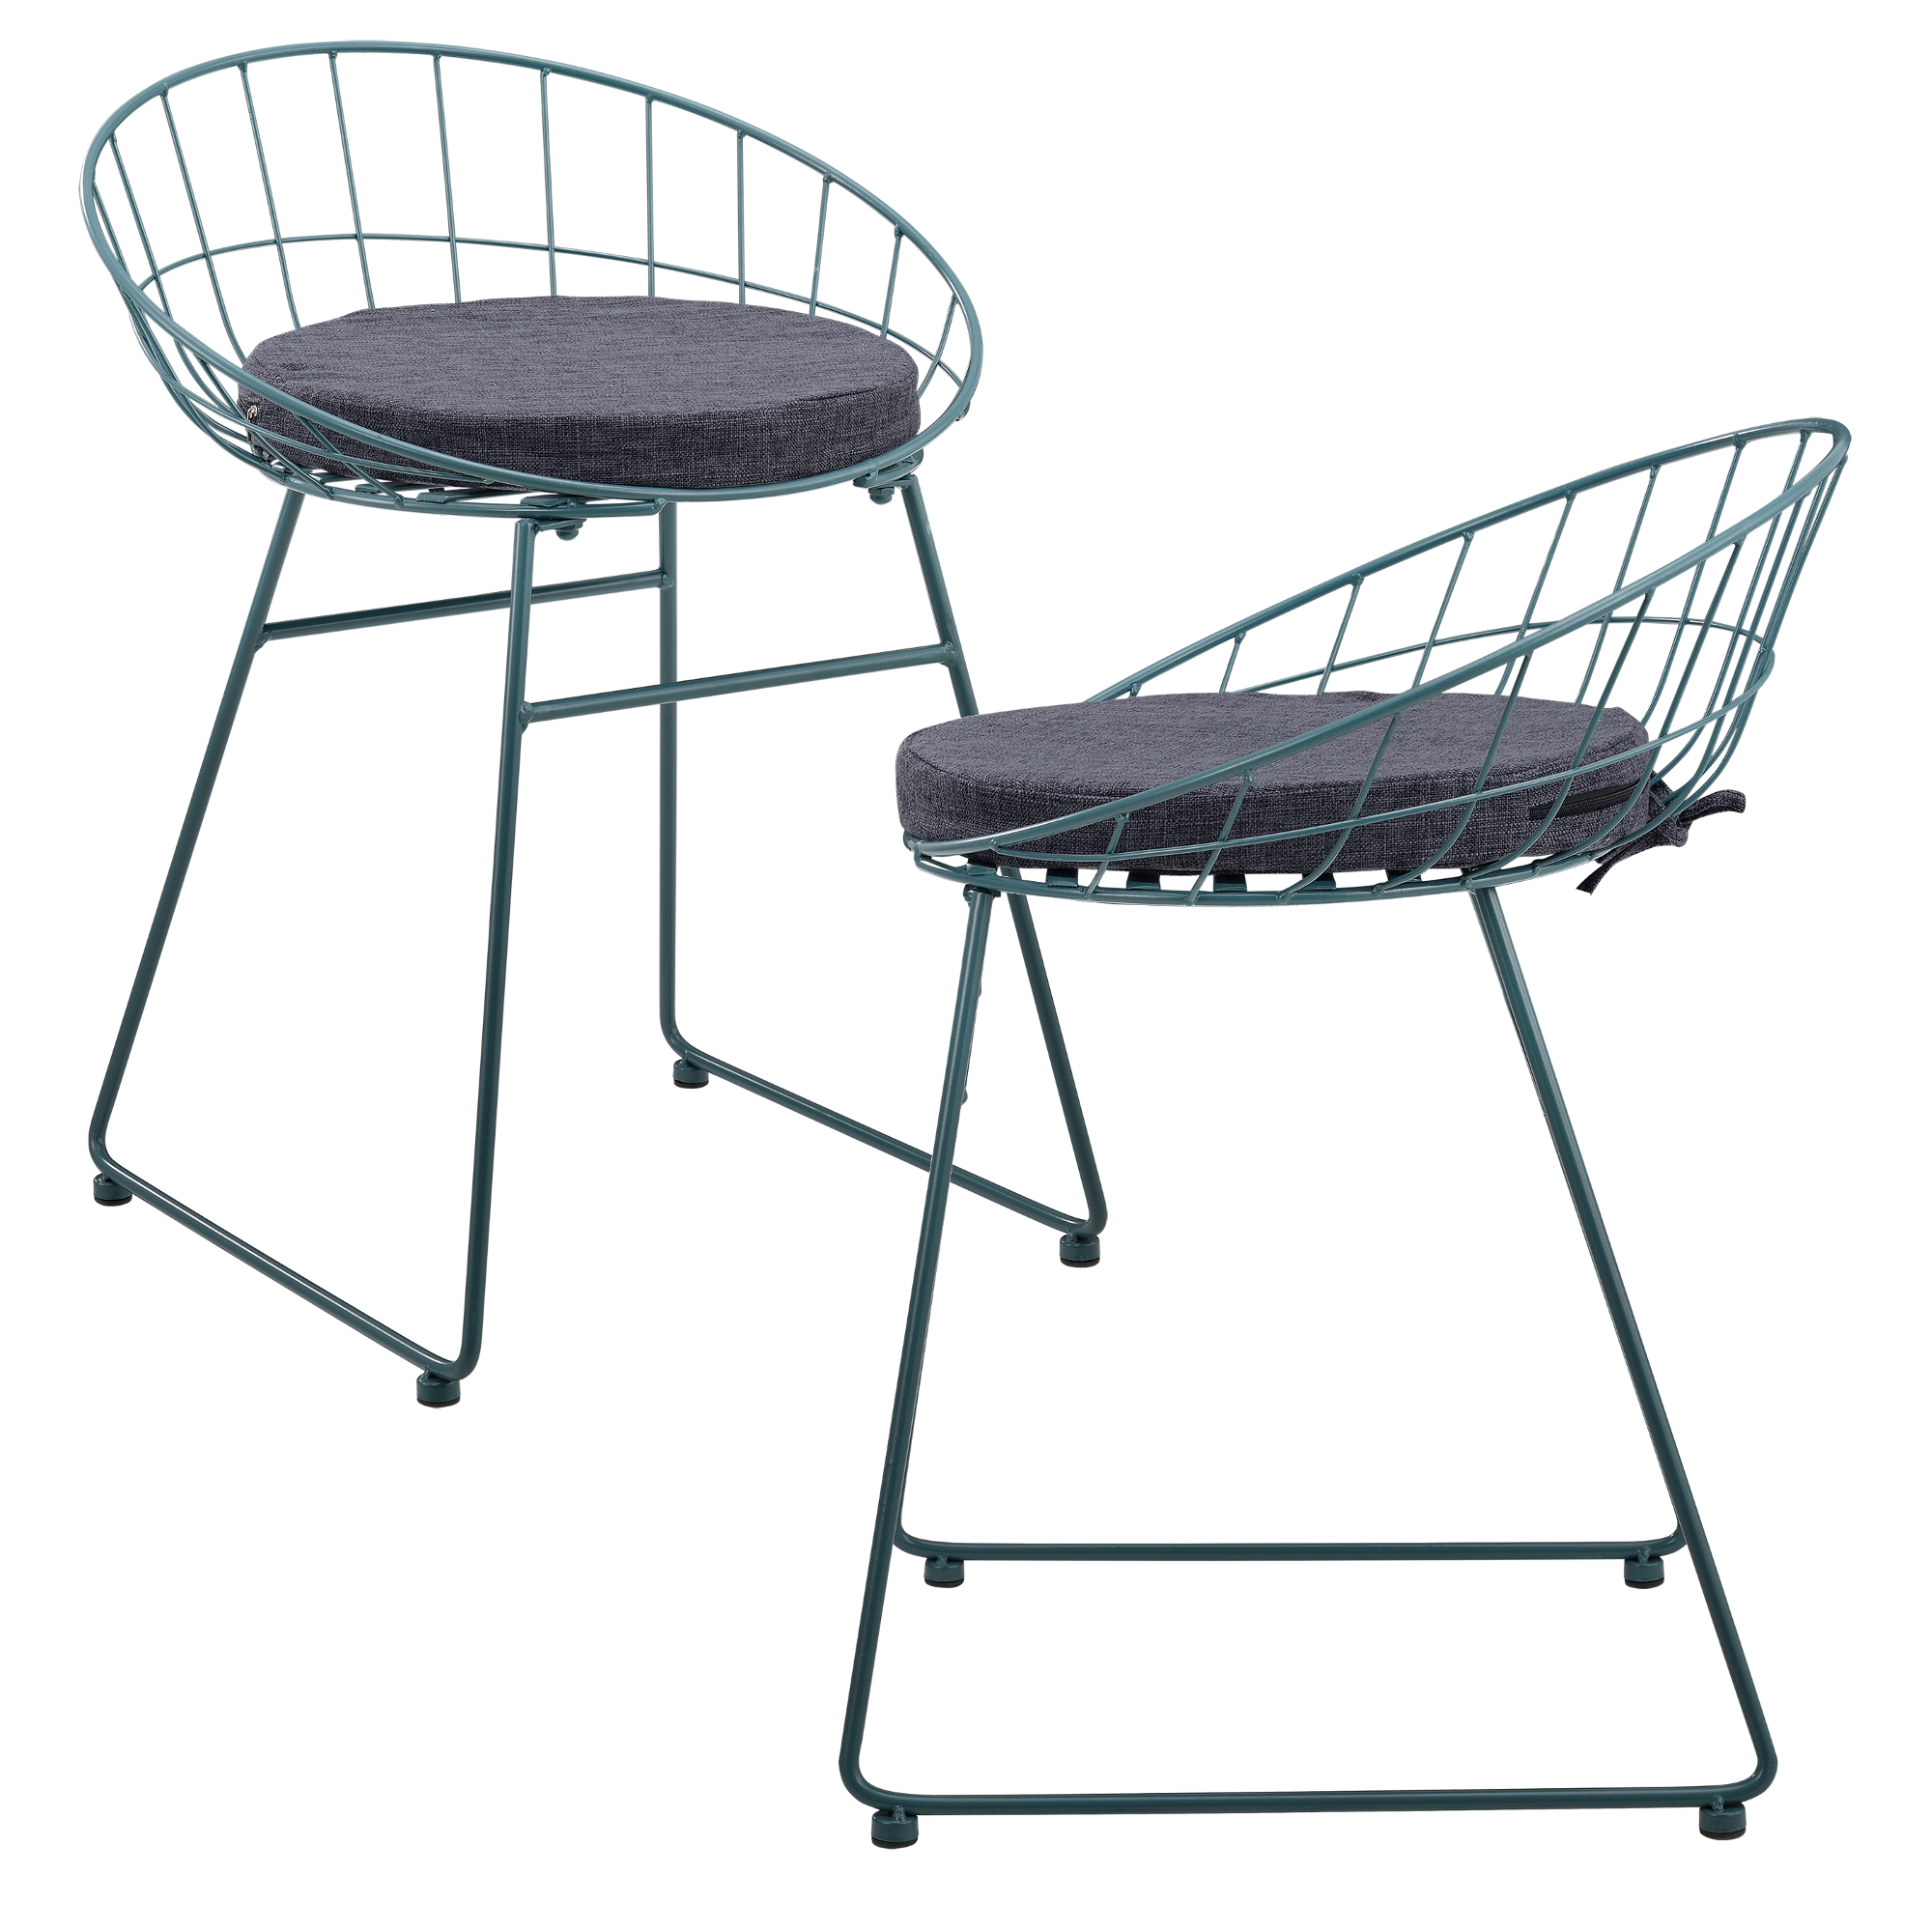 Fabelhaft Metall Stuhl Beste Wahl En-casa-2x-design-stuehle-metall-stuhl-set-